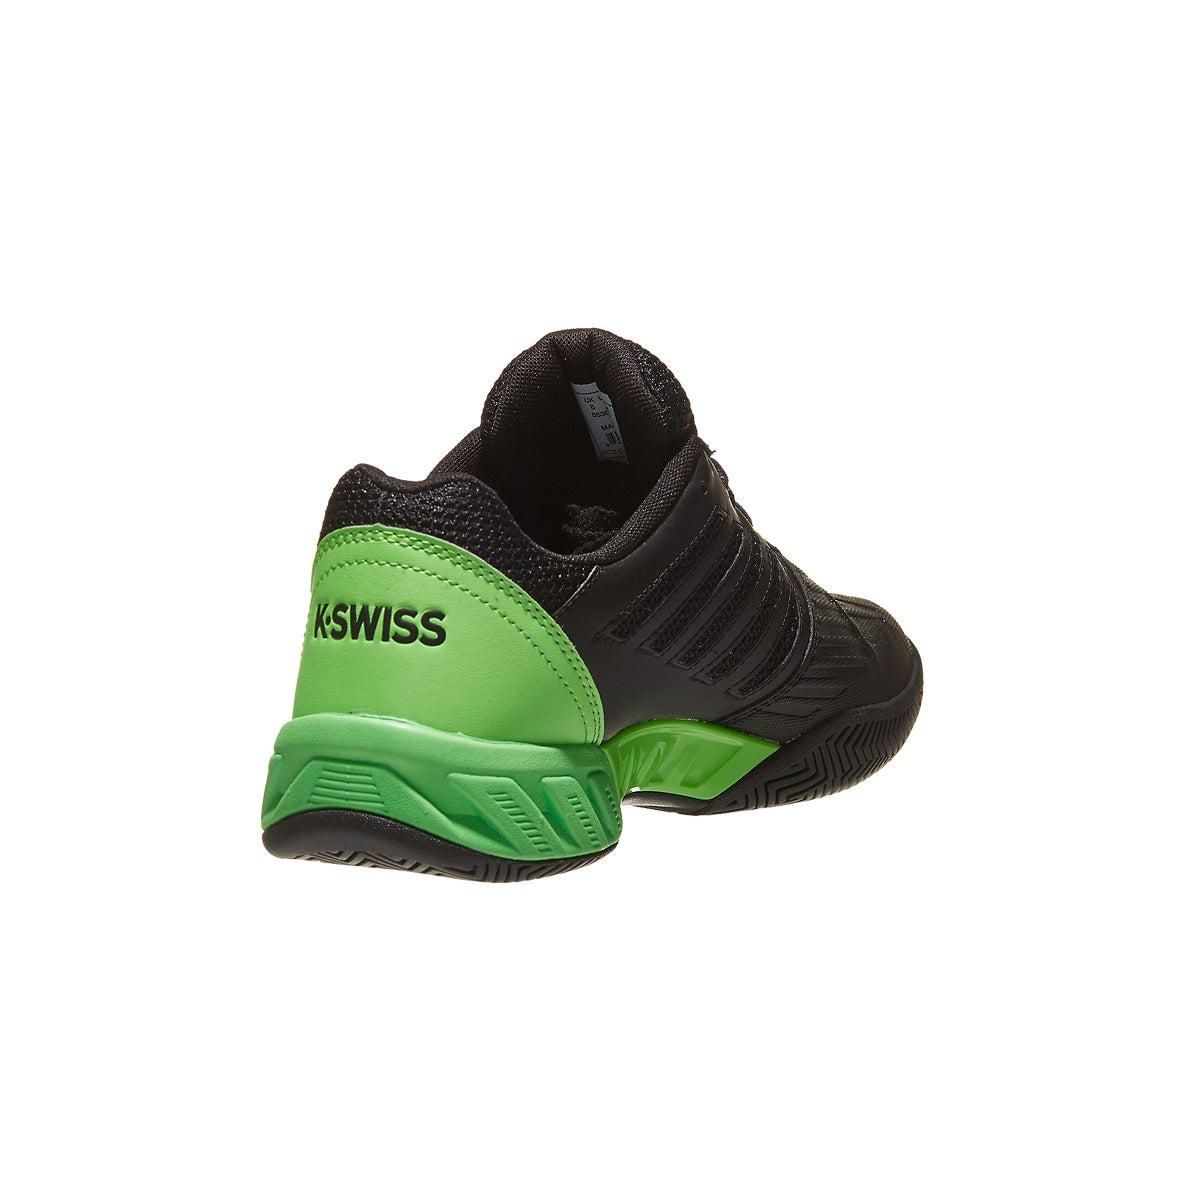 bc54ca2b8c370 KSwiss Bigshot Light 3 Black/Neon Lime Men's Shoes 360° View